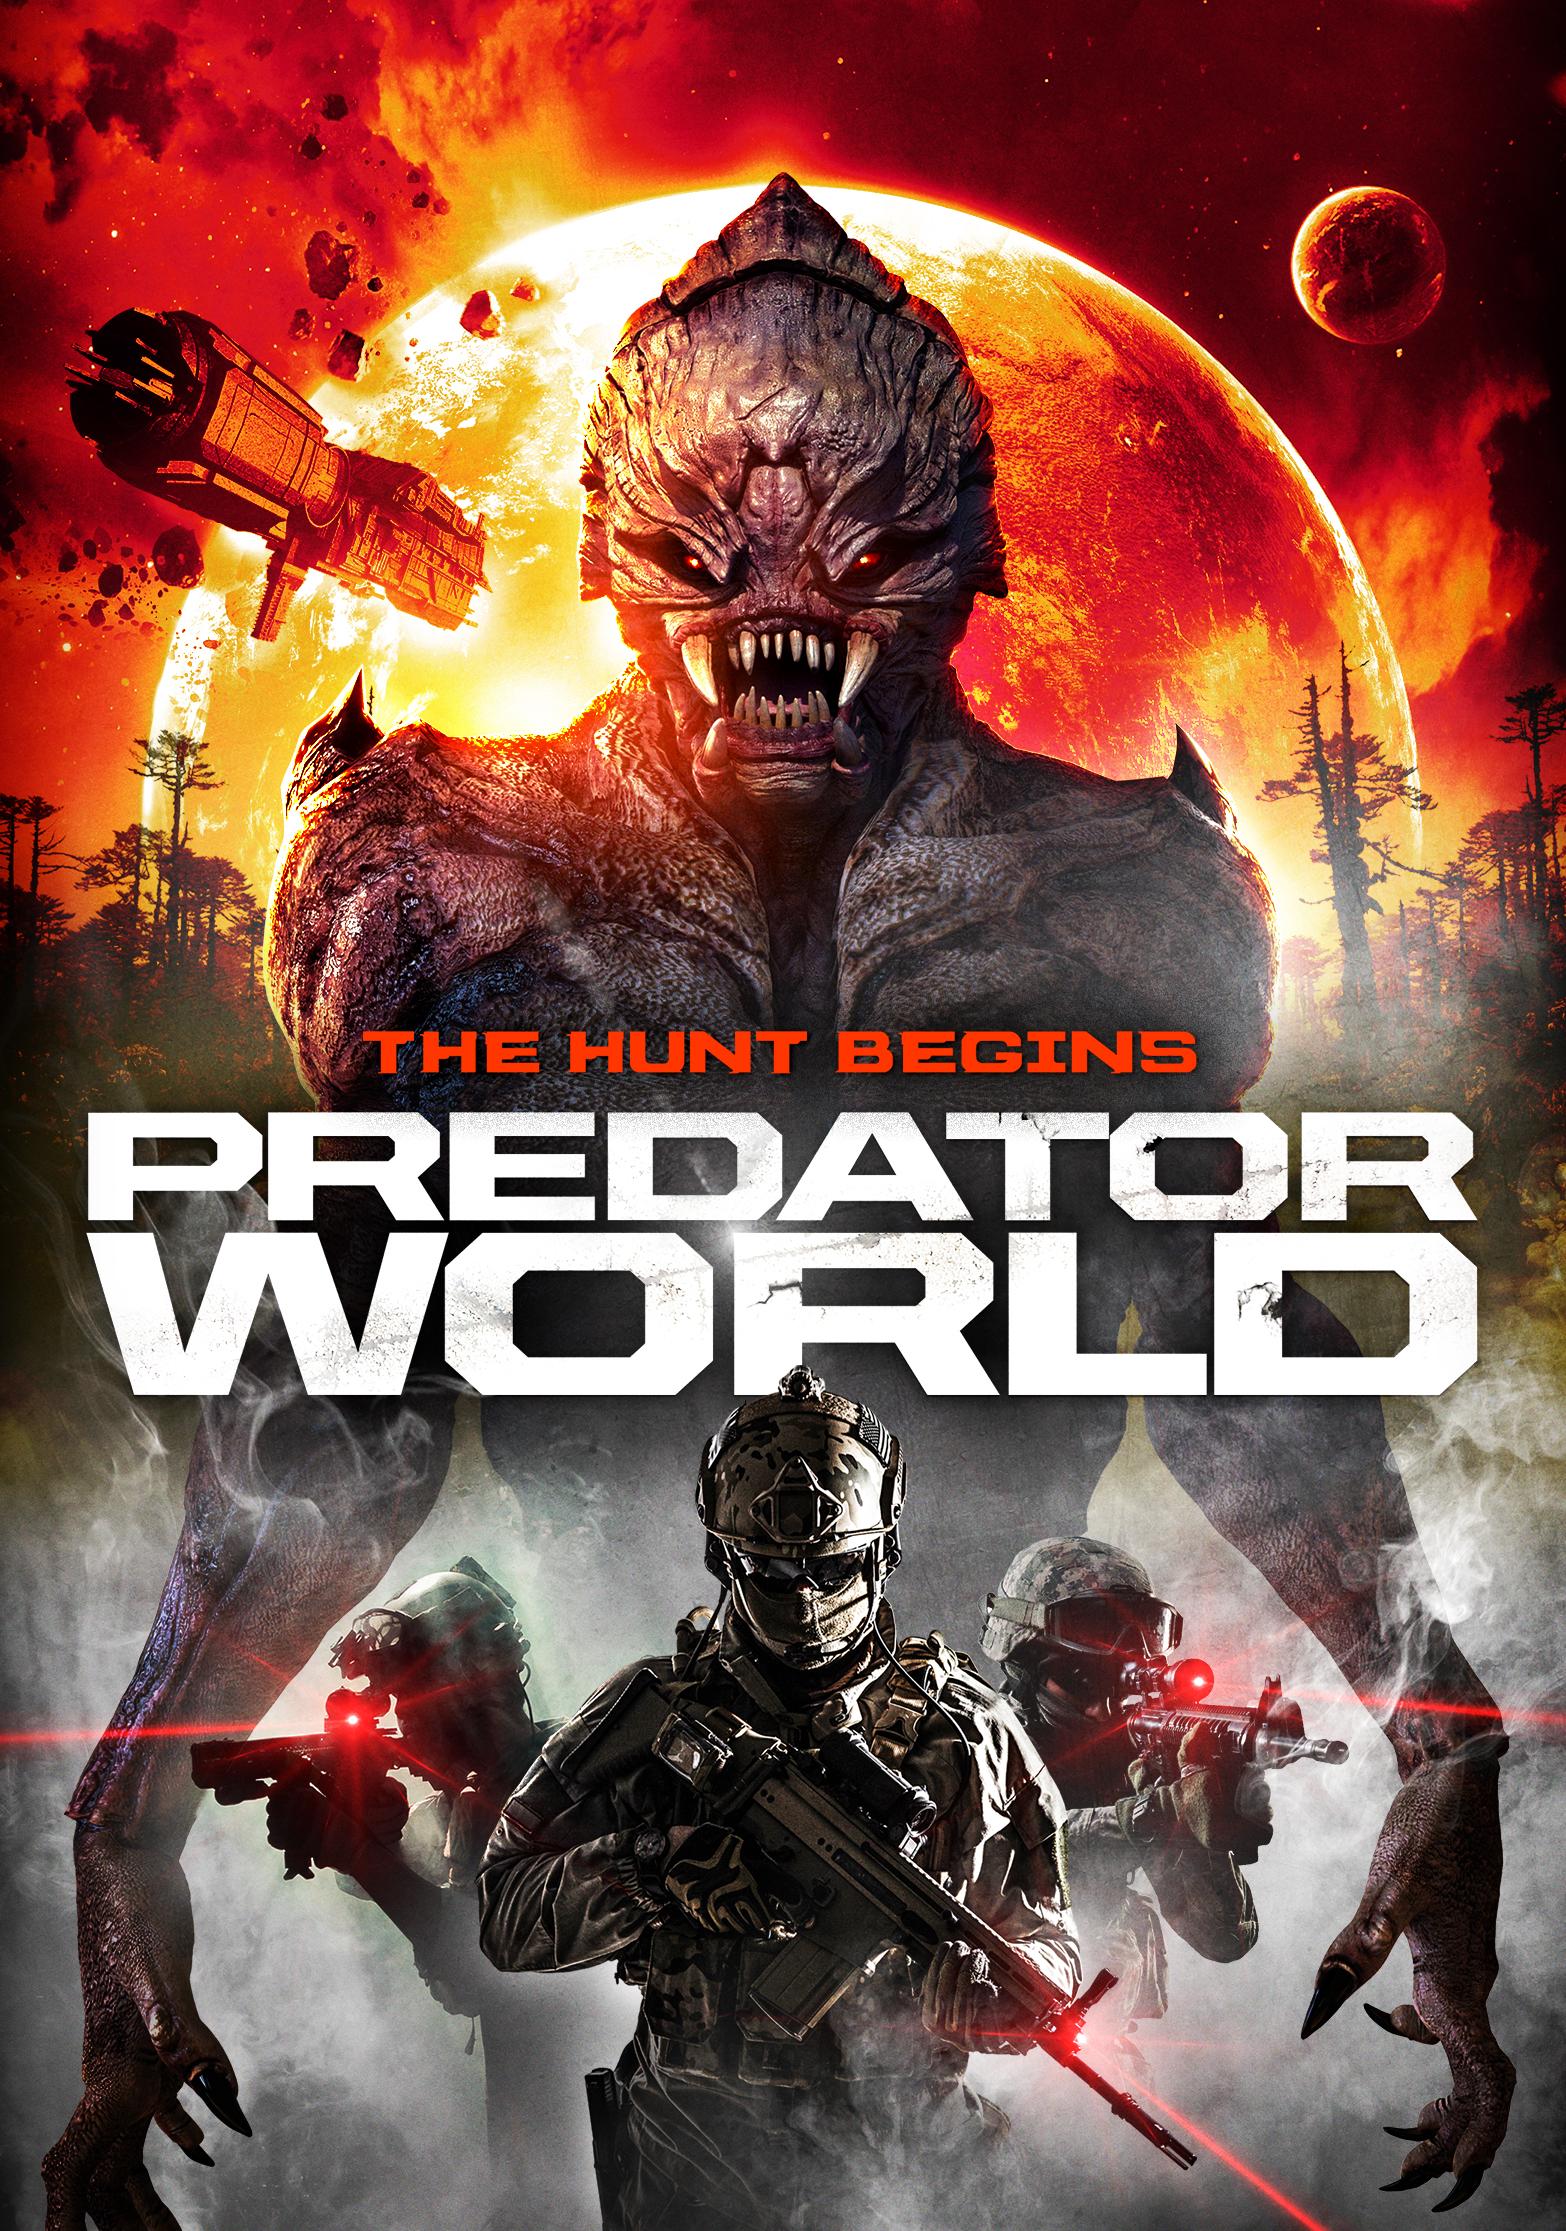 Predator World (2017) - IMDb